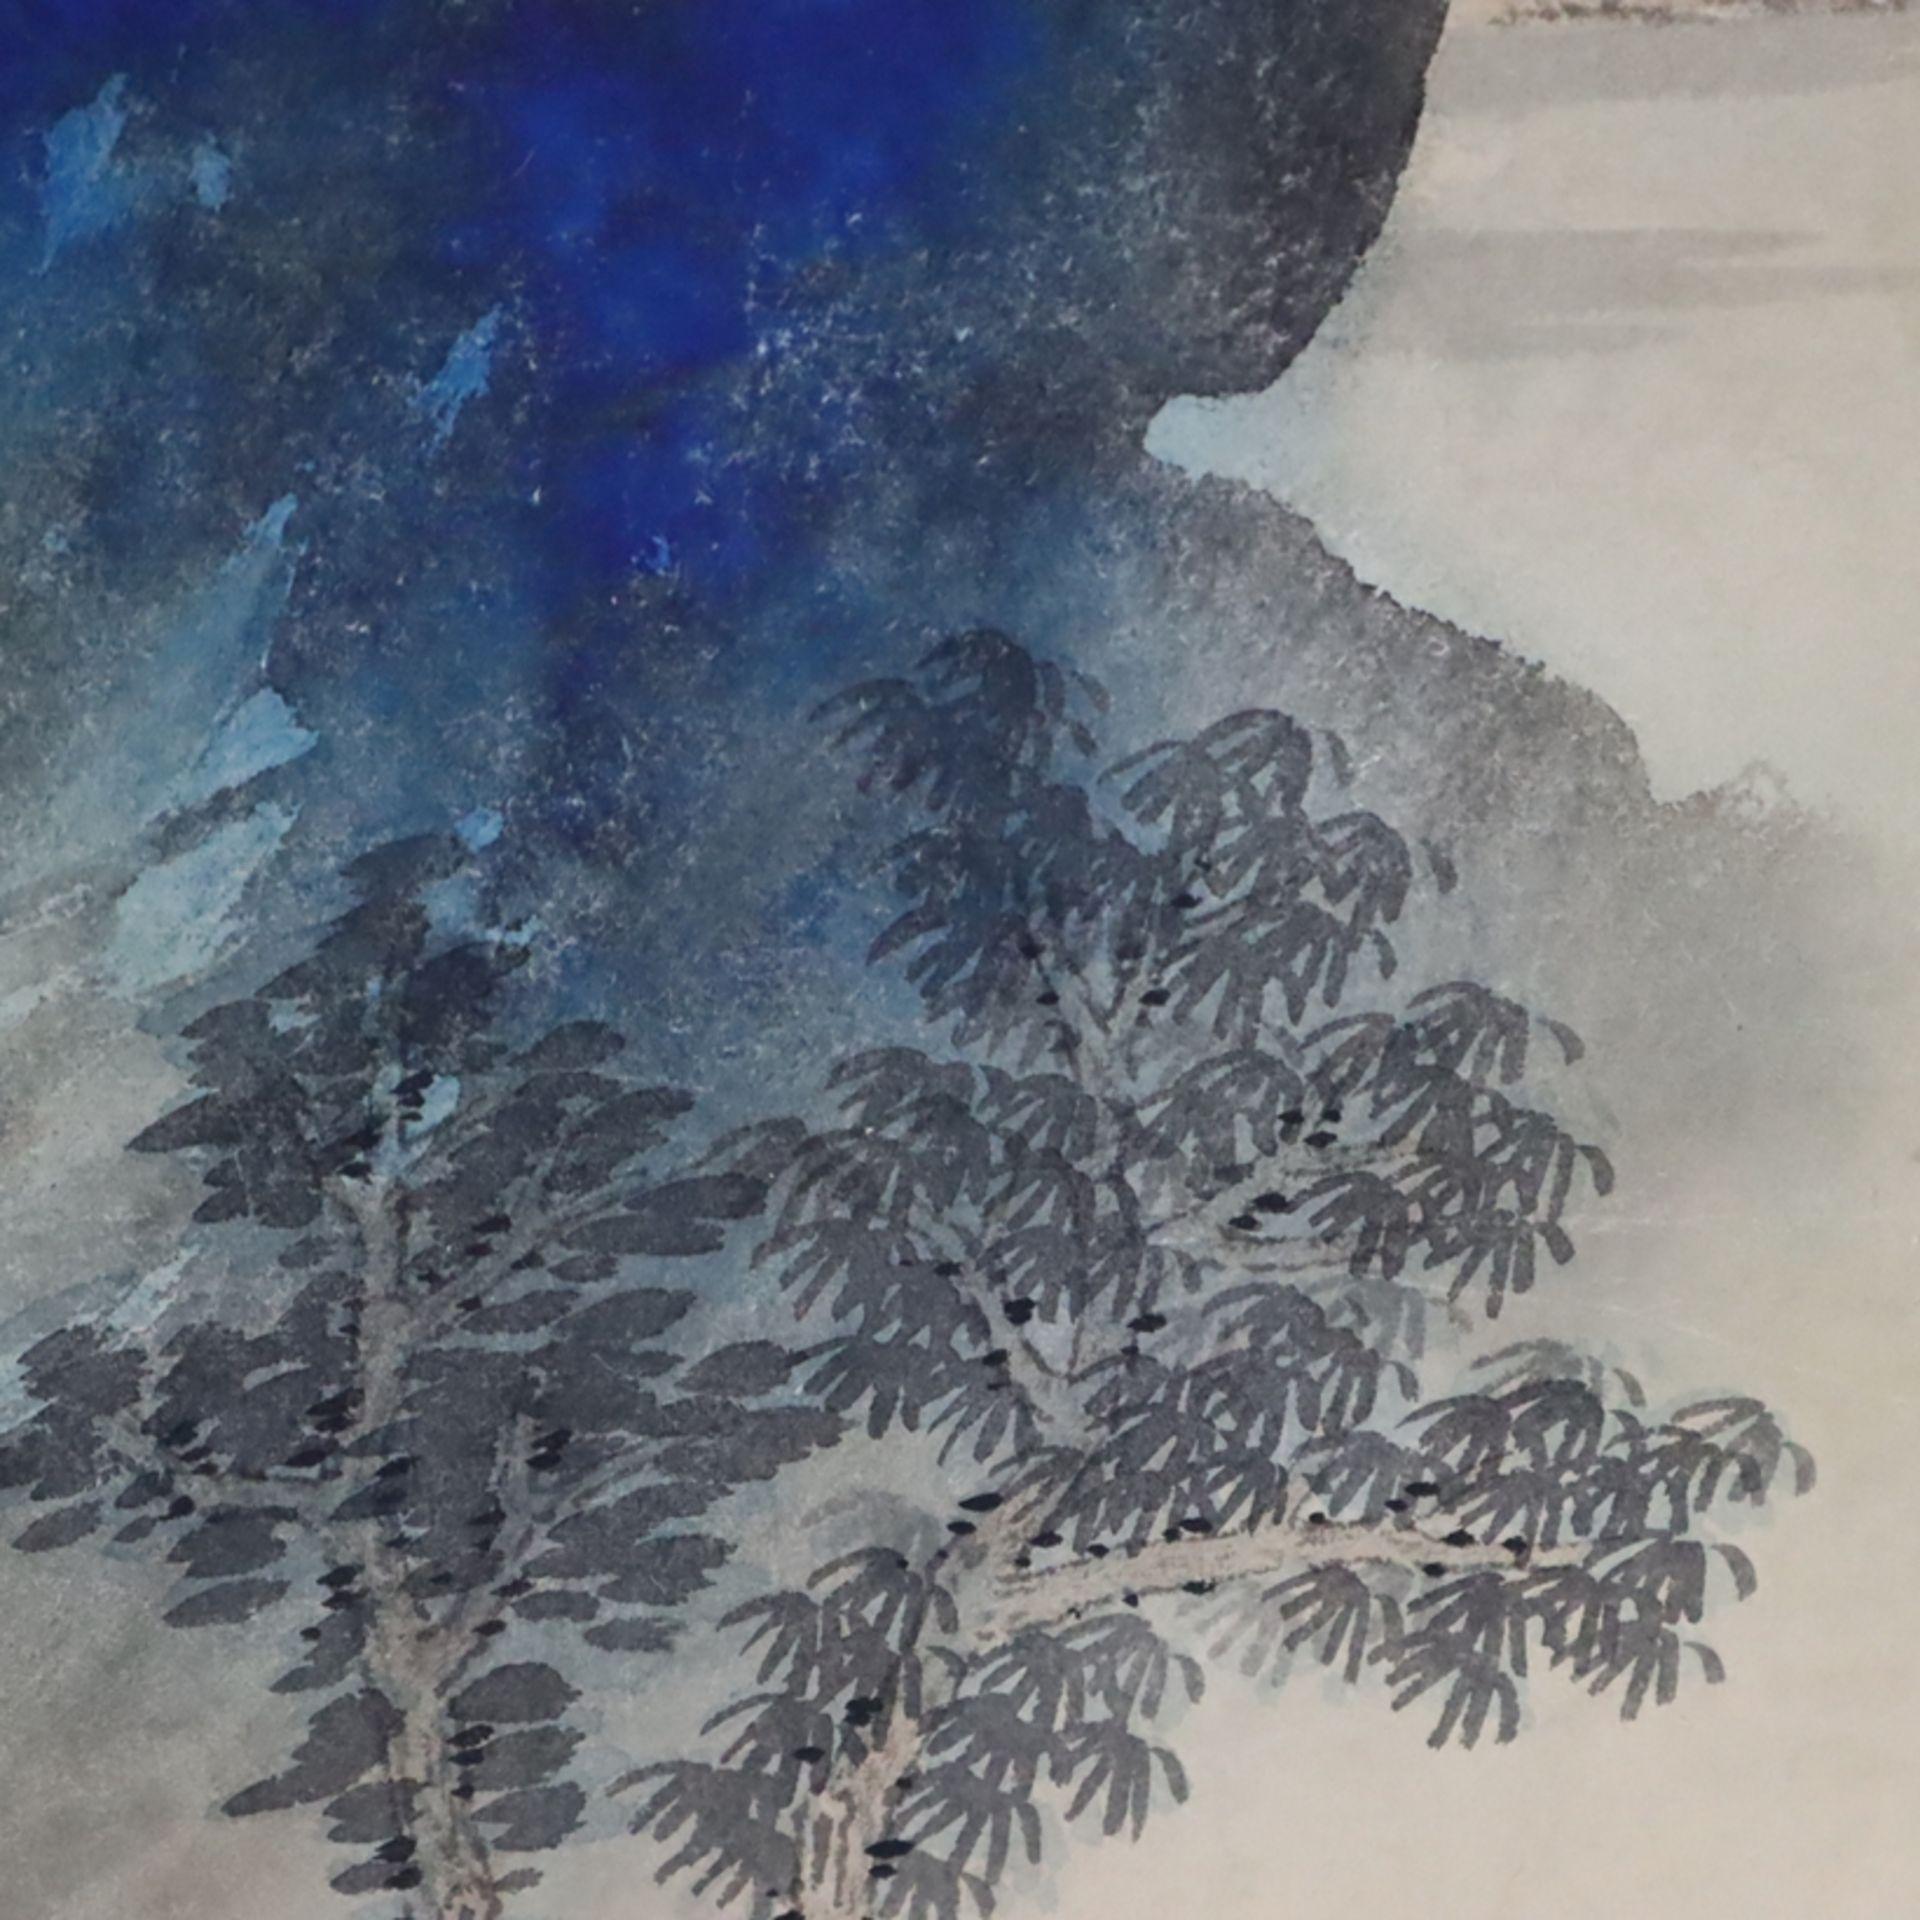 Chinesisches Rollbild - gesiegelt Zhang Daqian (   Chinese Hanging Scroll - sealed Zhang Daqian (18 - Image 13 of 18